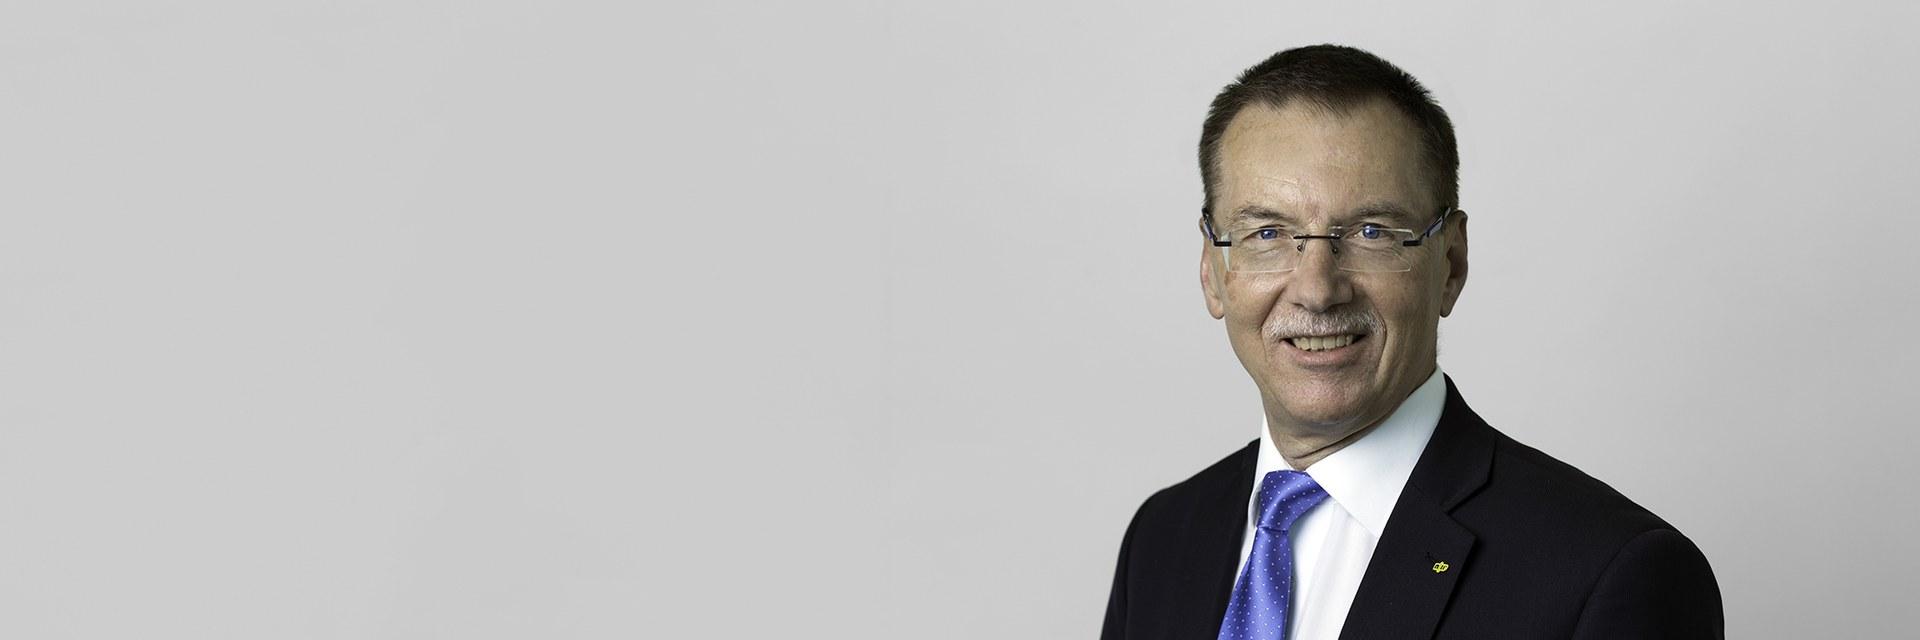 Prof. Rainer Schnaidt